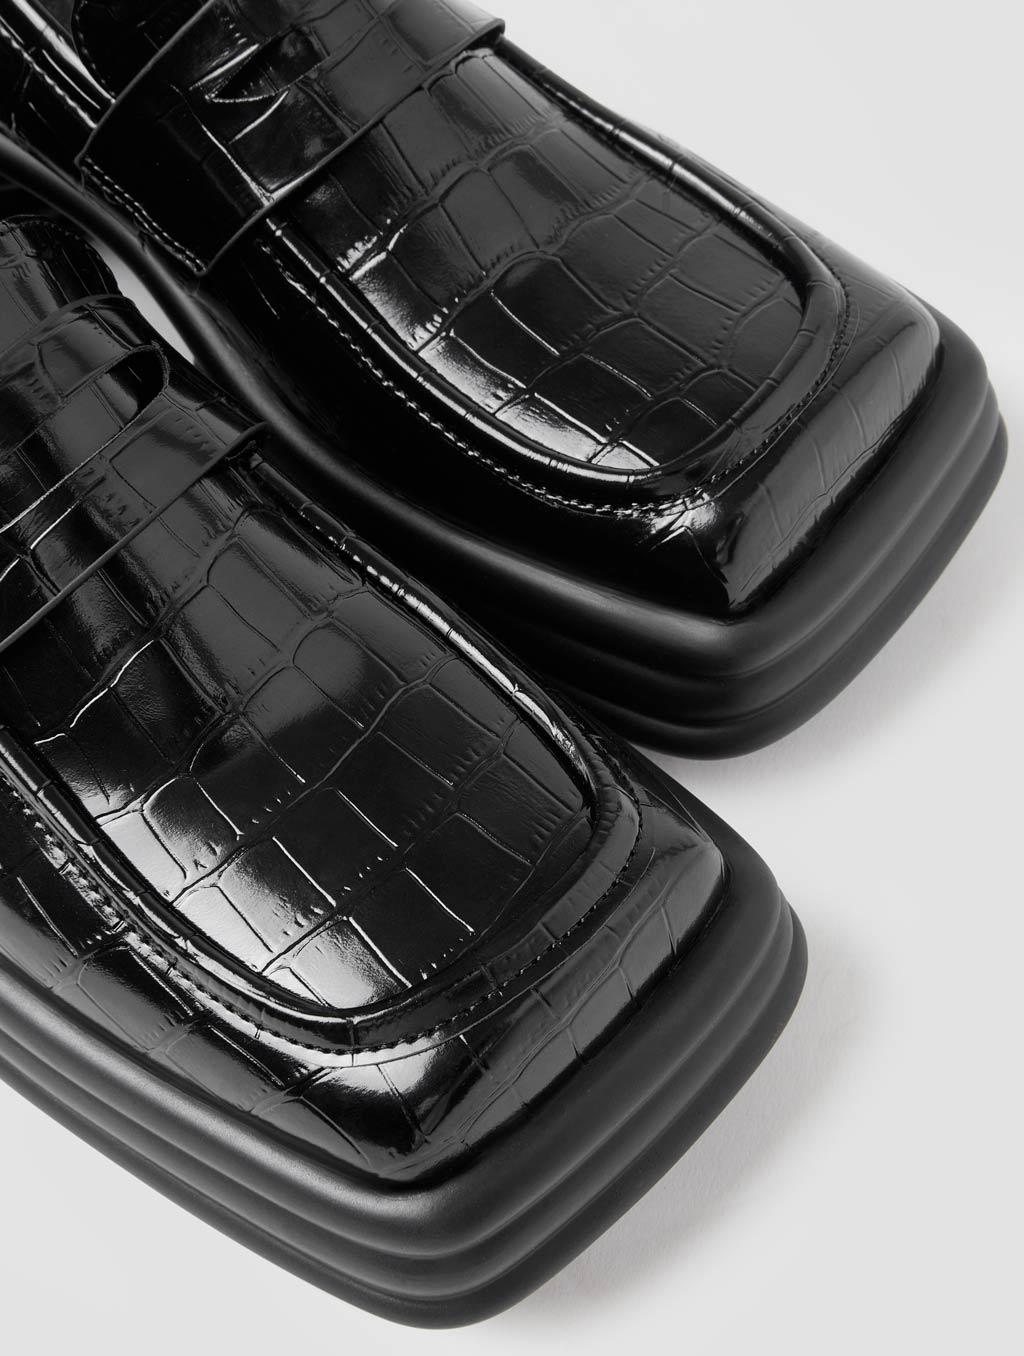 Square Toe Loafers - detail -Crocodile-print Black2